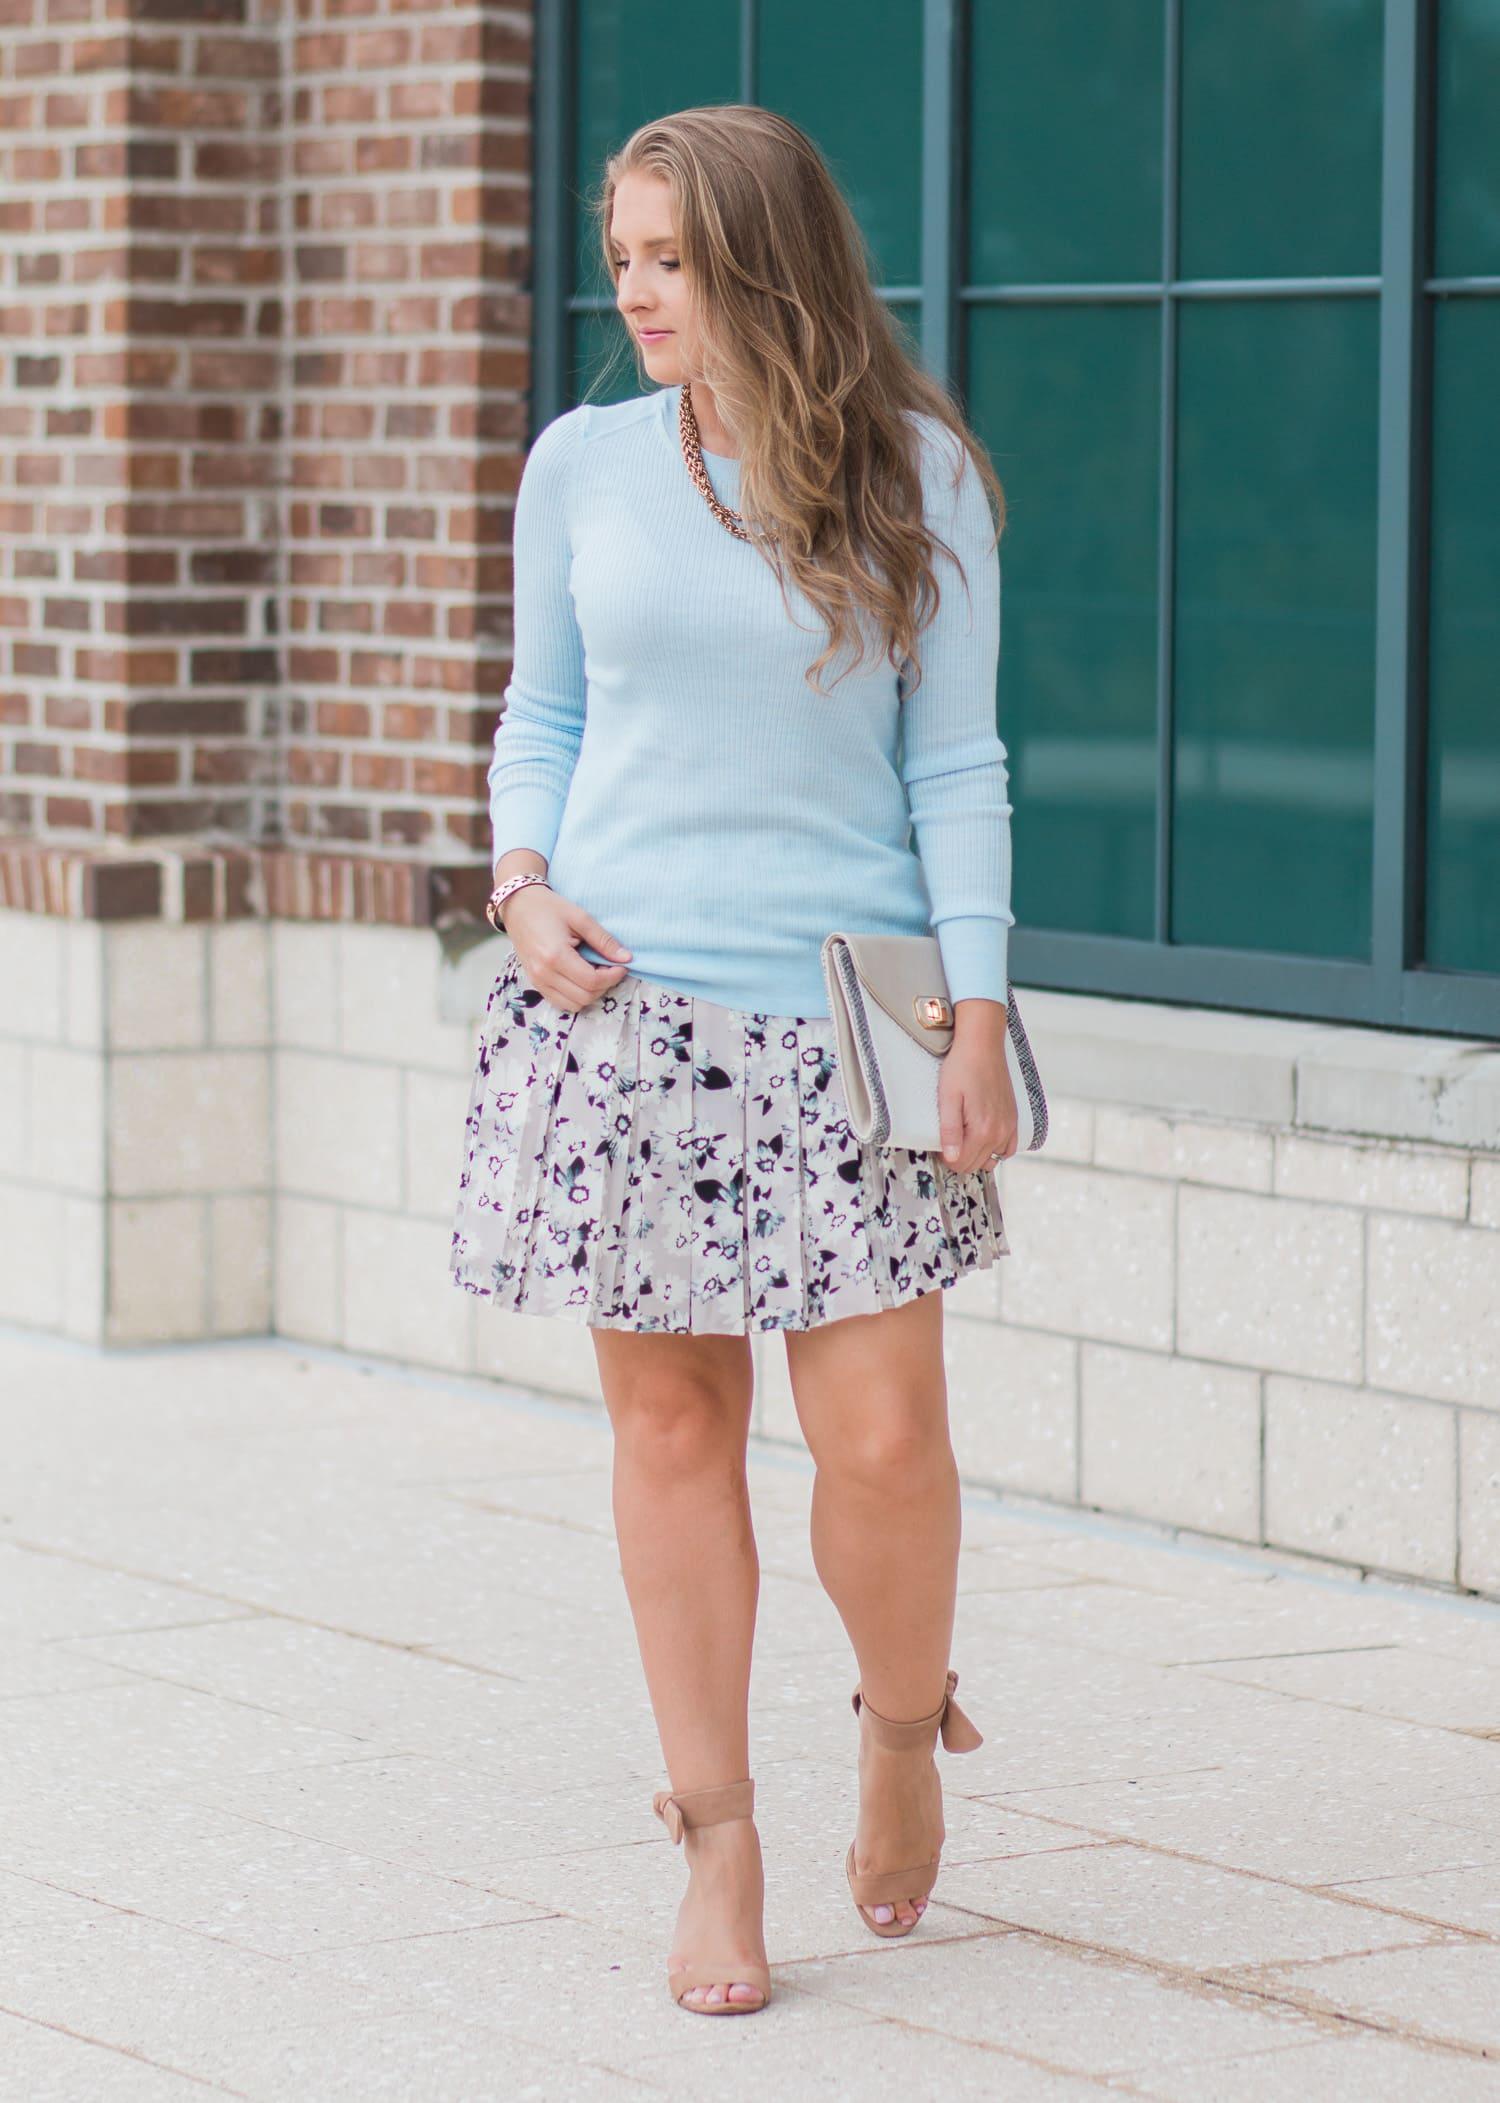 banana-republic-floral-pleated-skirt-ribbed-light-blue-sweater-blogger-ashley-brooke-nicholas-4904